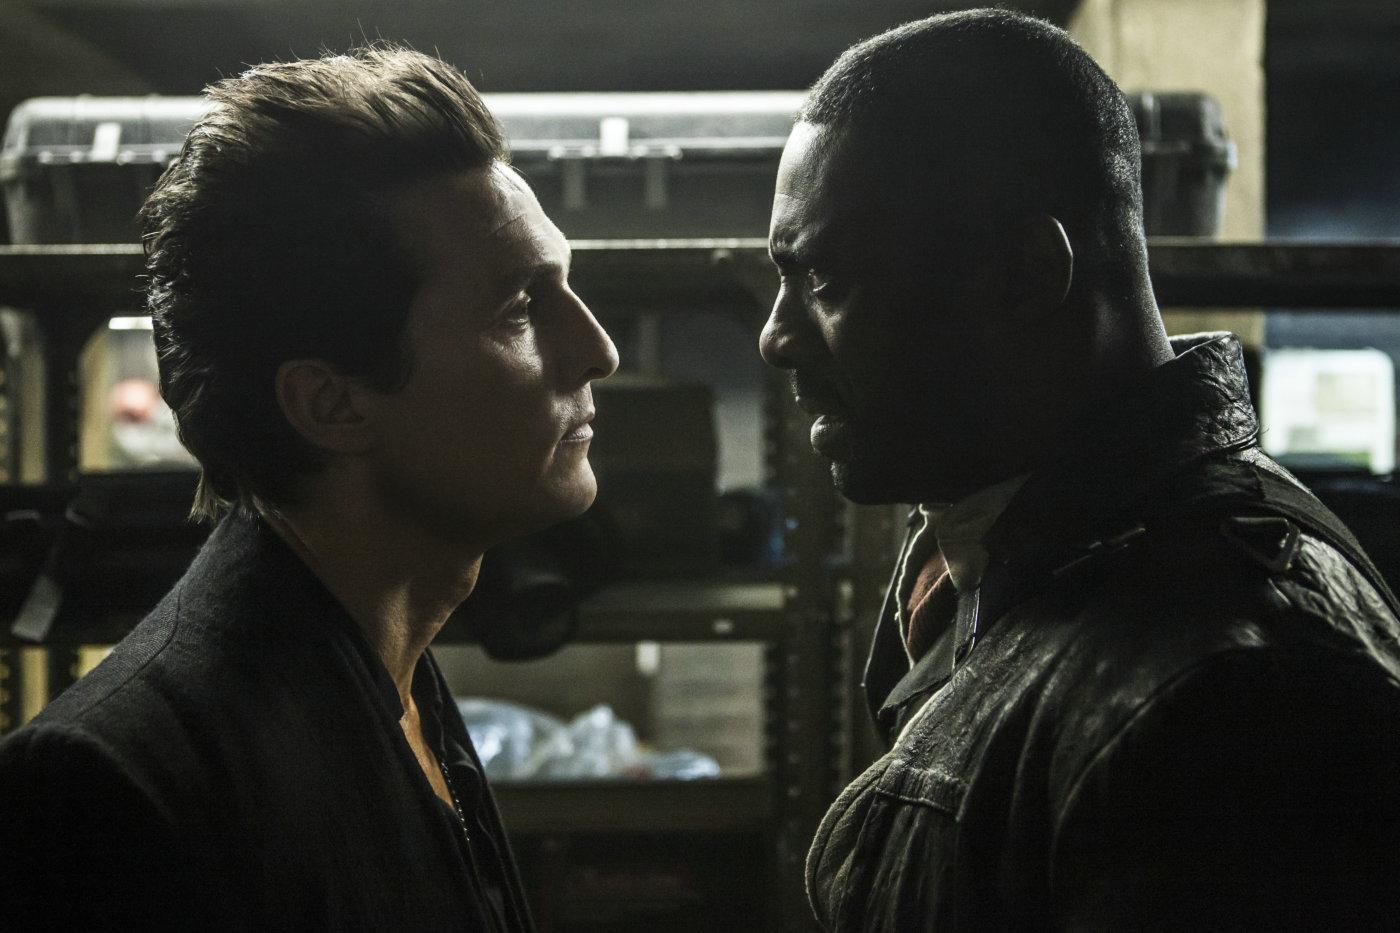 Matthew McConaughey & Idris Elba